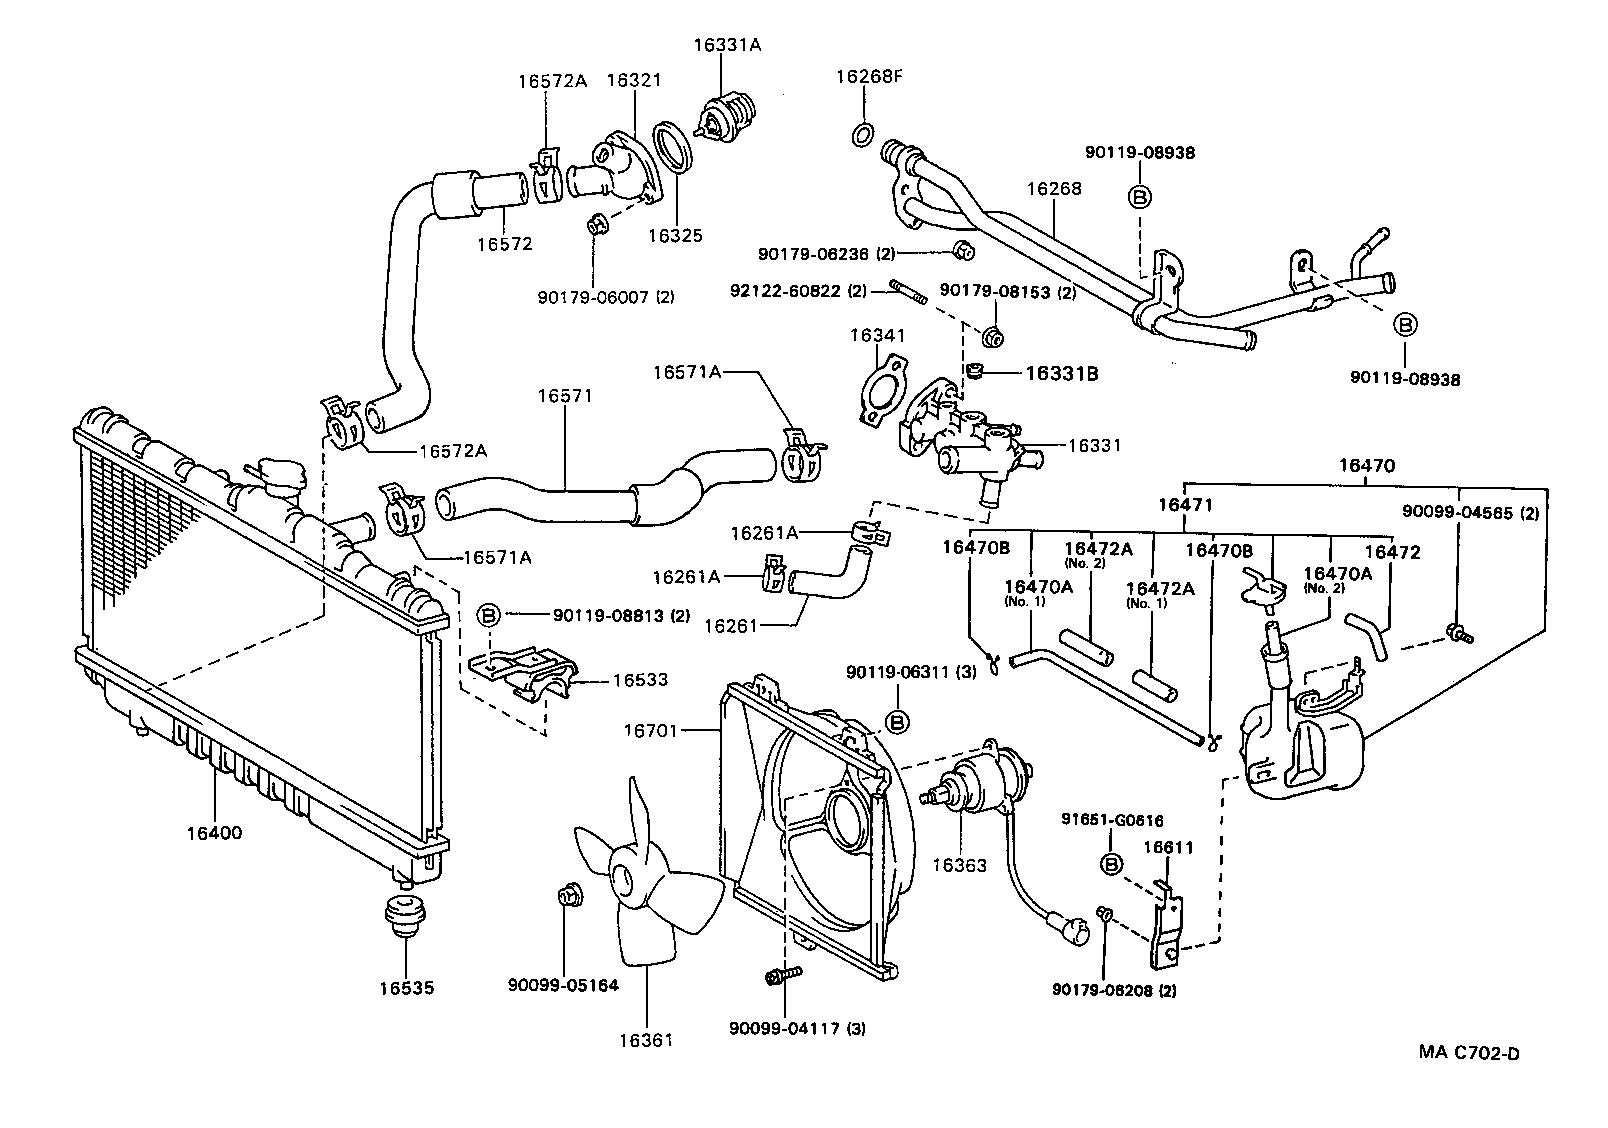 Toyota Celicast184r-blpvkq - Tool-engine-fuel